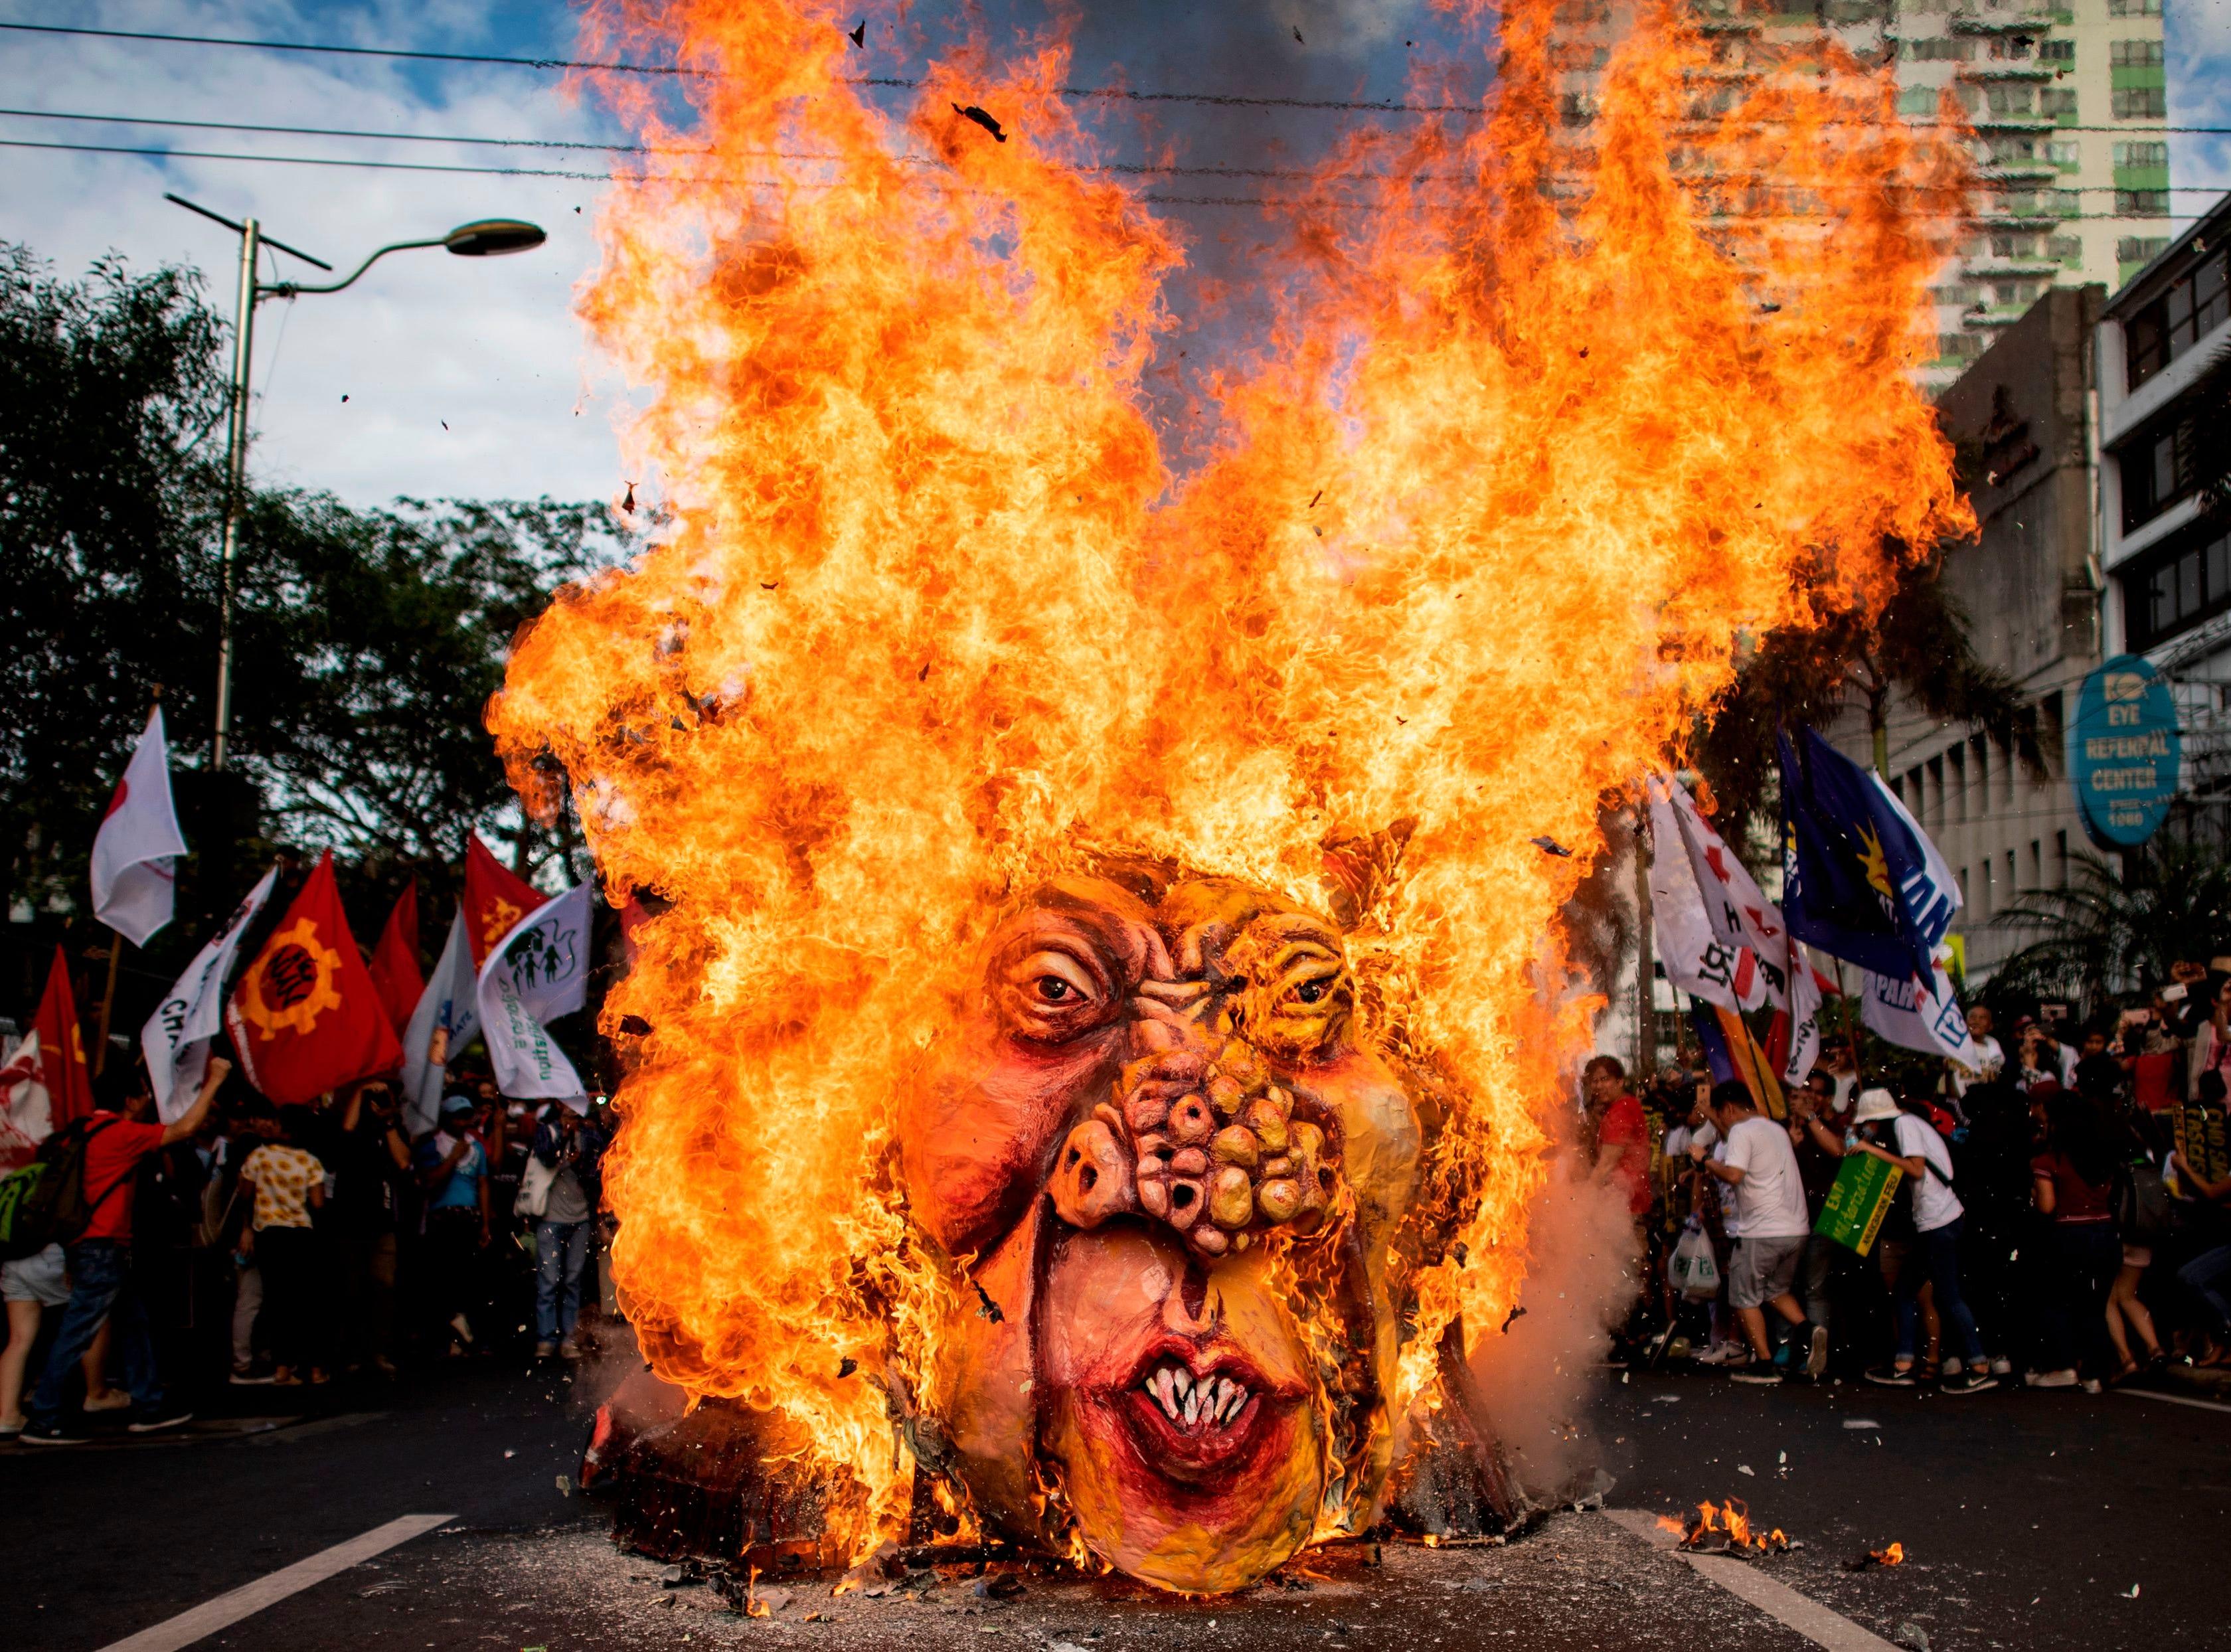 Activists burn an effigy of Philippine President Rodrigo Duterte near the US Embassy in Manila on November 30, 2018, during the commemoration of the 155th birthday of working-class hero Andres Bonifacio.